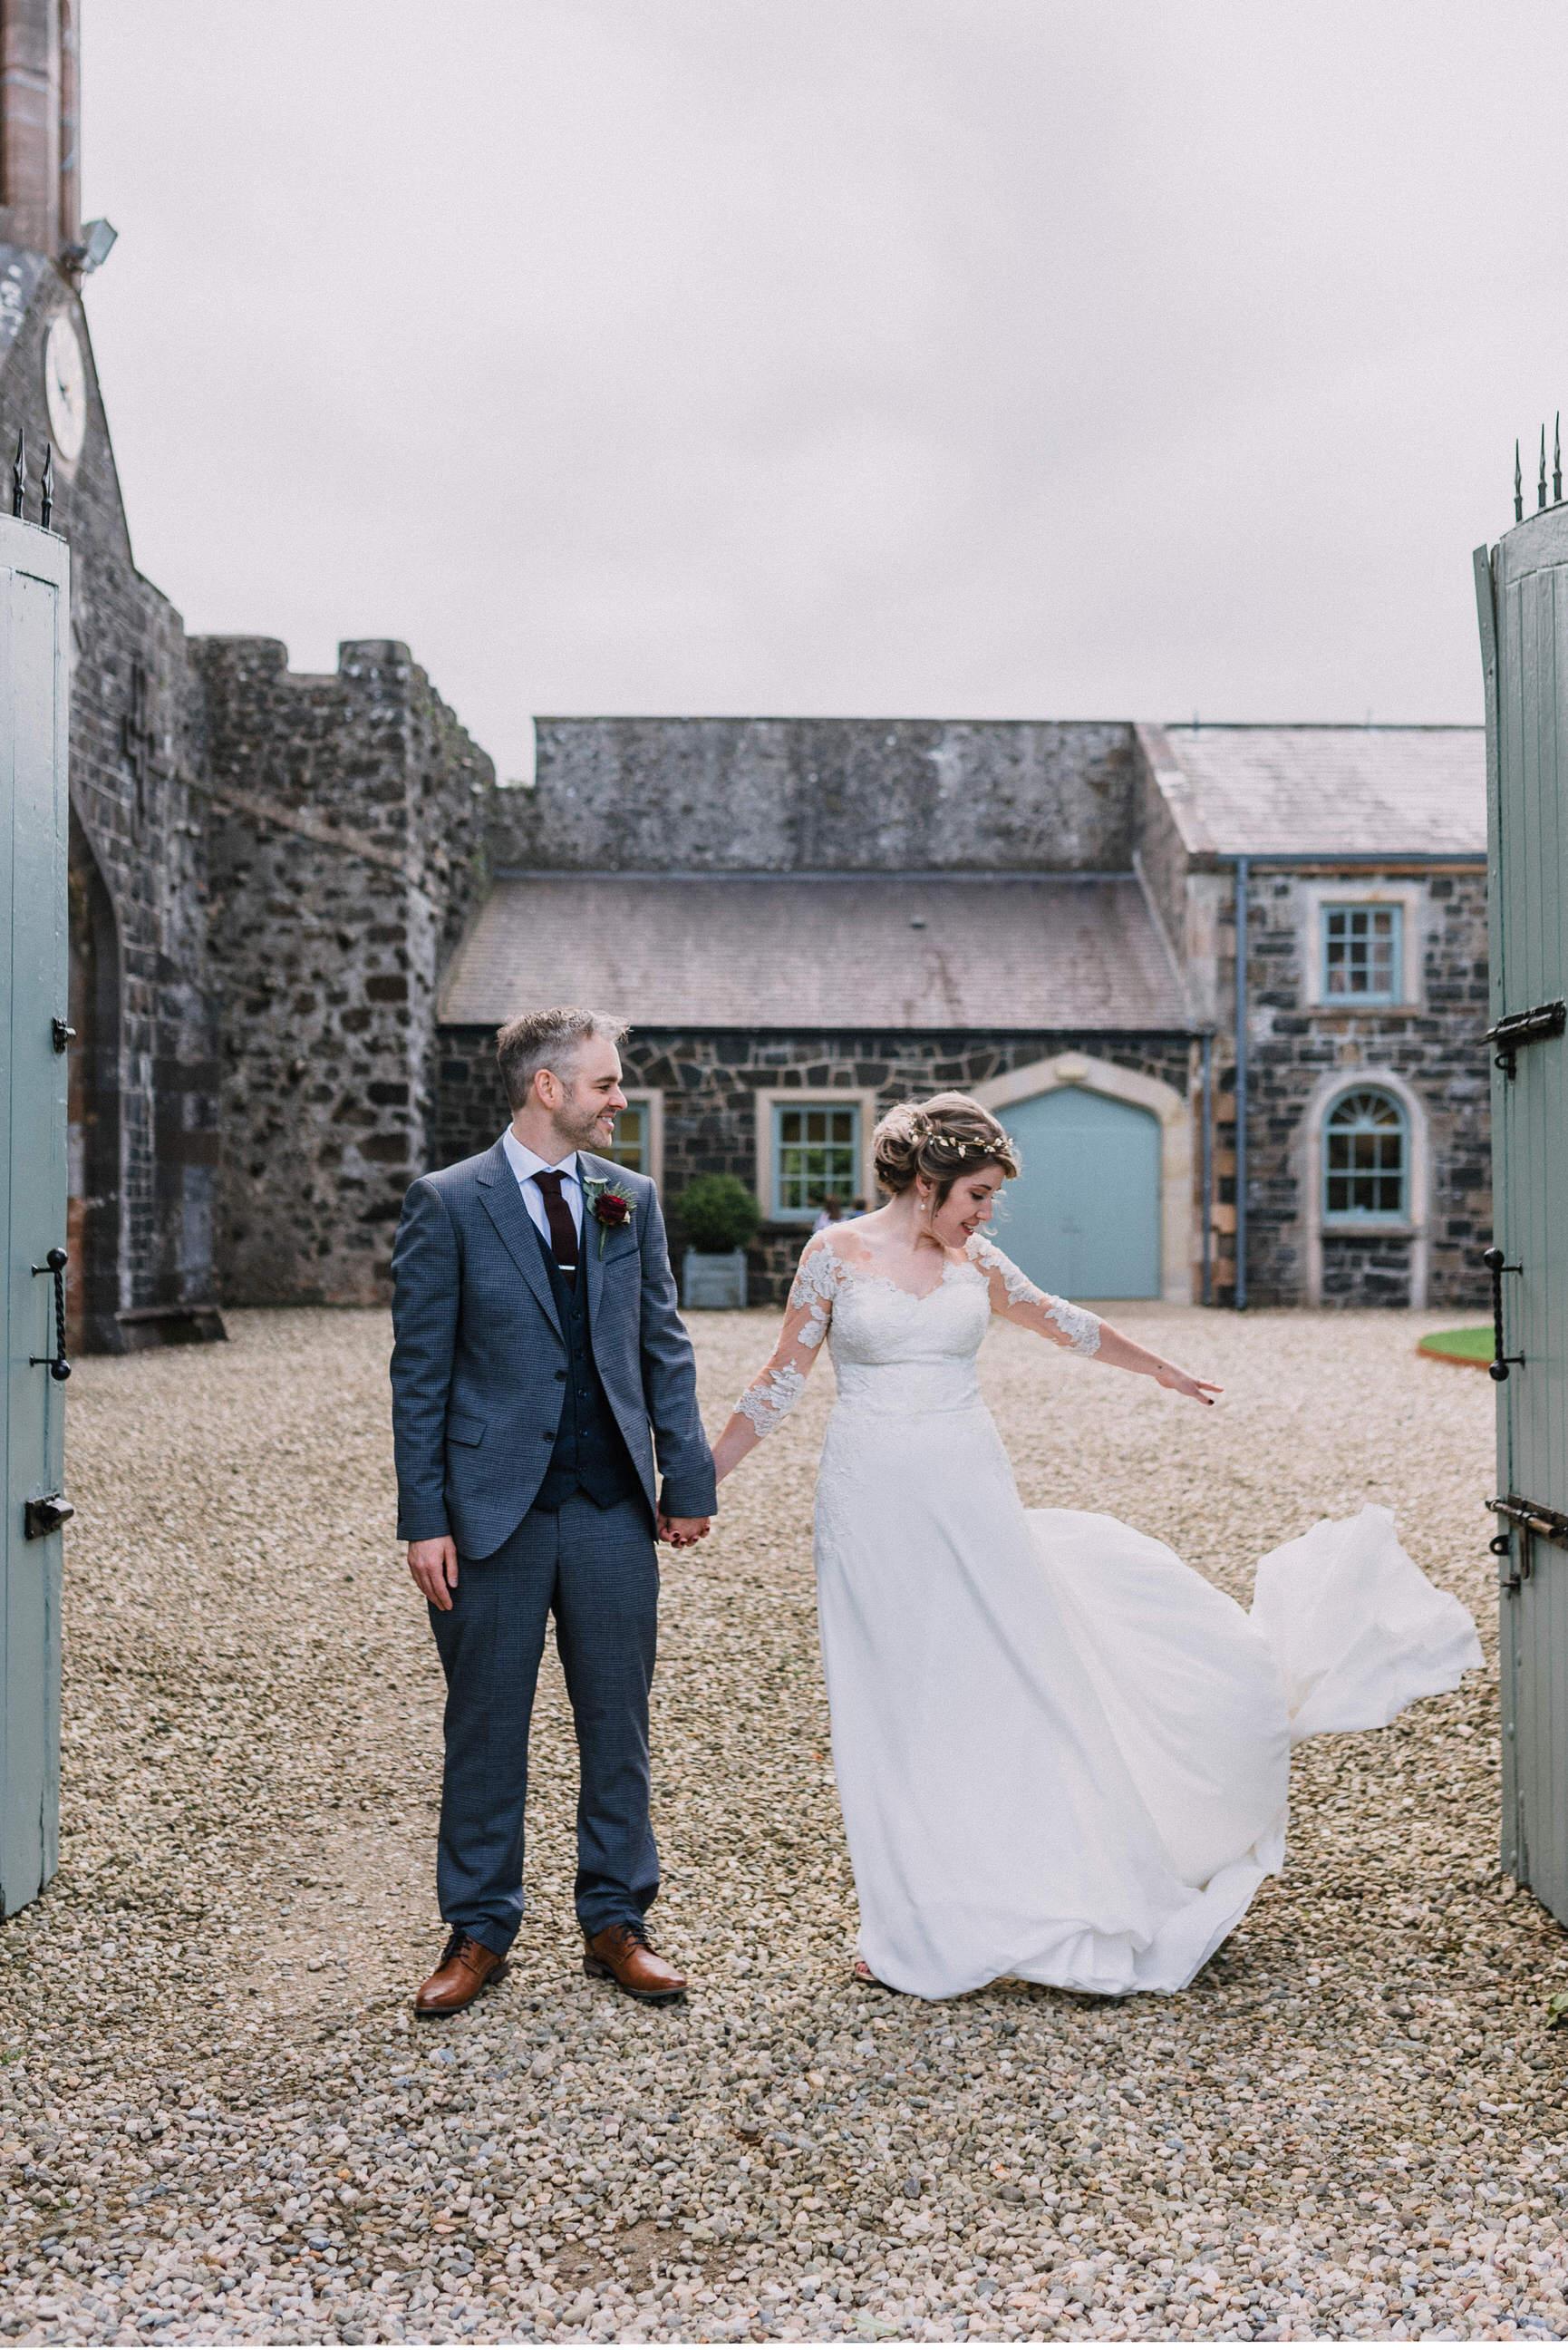 lissanoure castle wedding, northern ireland wedding photographer, romantic northern irish wedding venue, castle wedding ireland, natural wedding photography ni (89).jpg